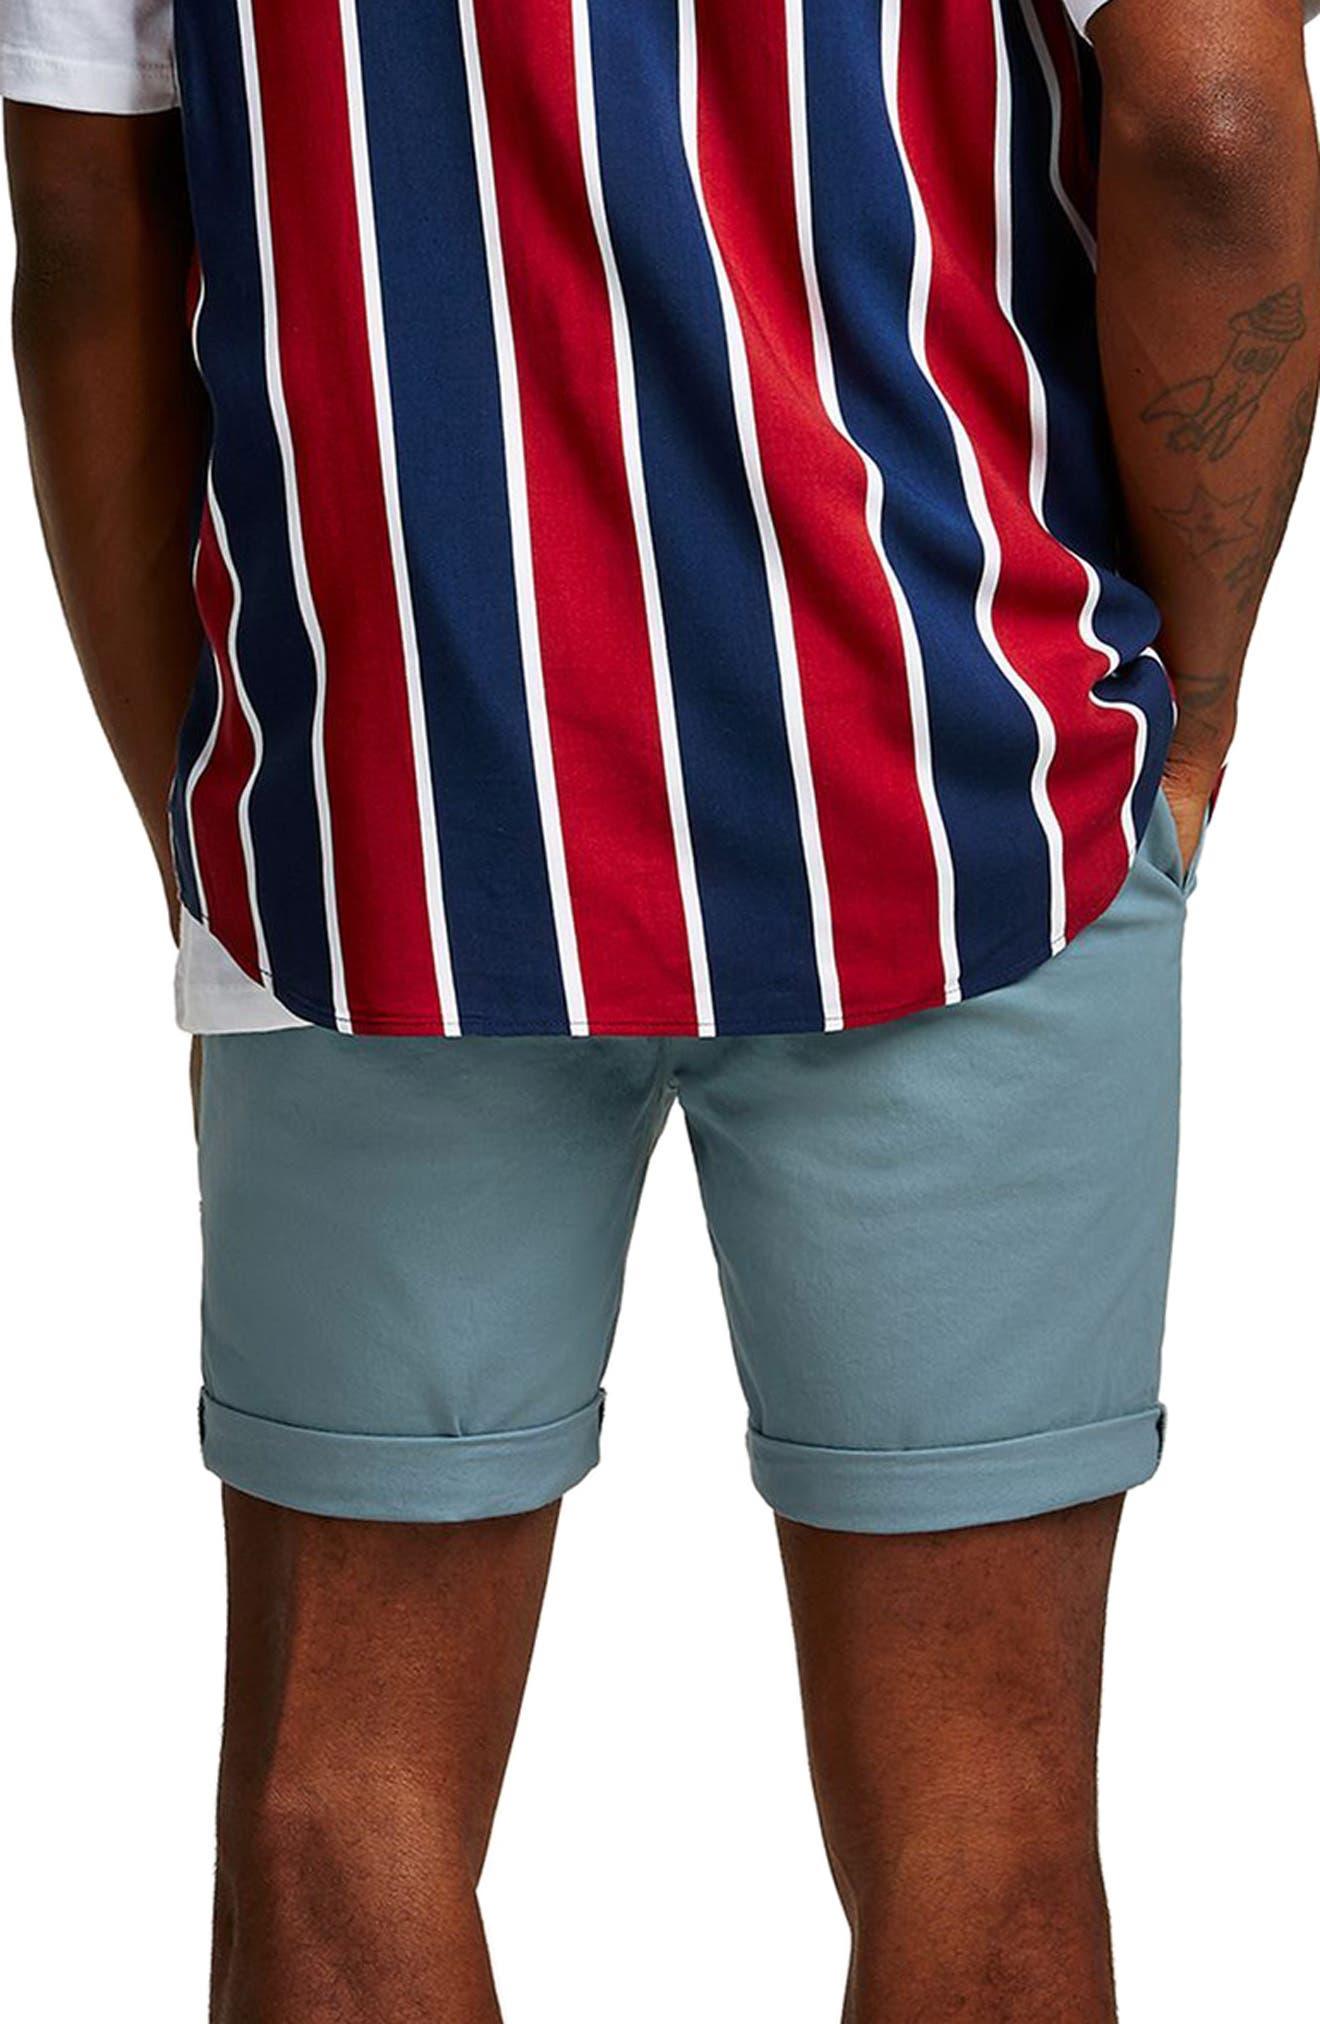 Skinny Fit Chino Shorts,                             Alternate thumbnail 2, color,                             Dark Blue